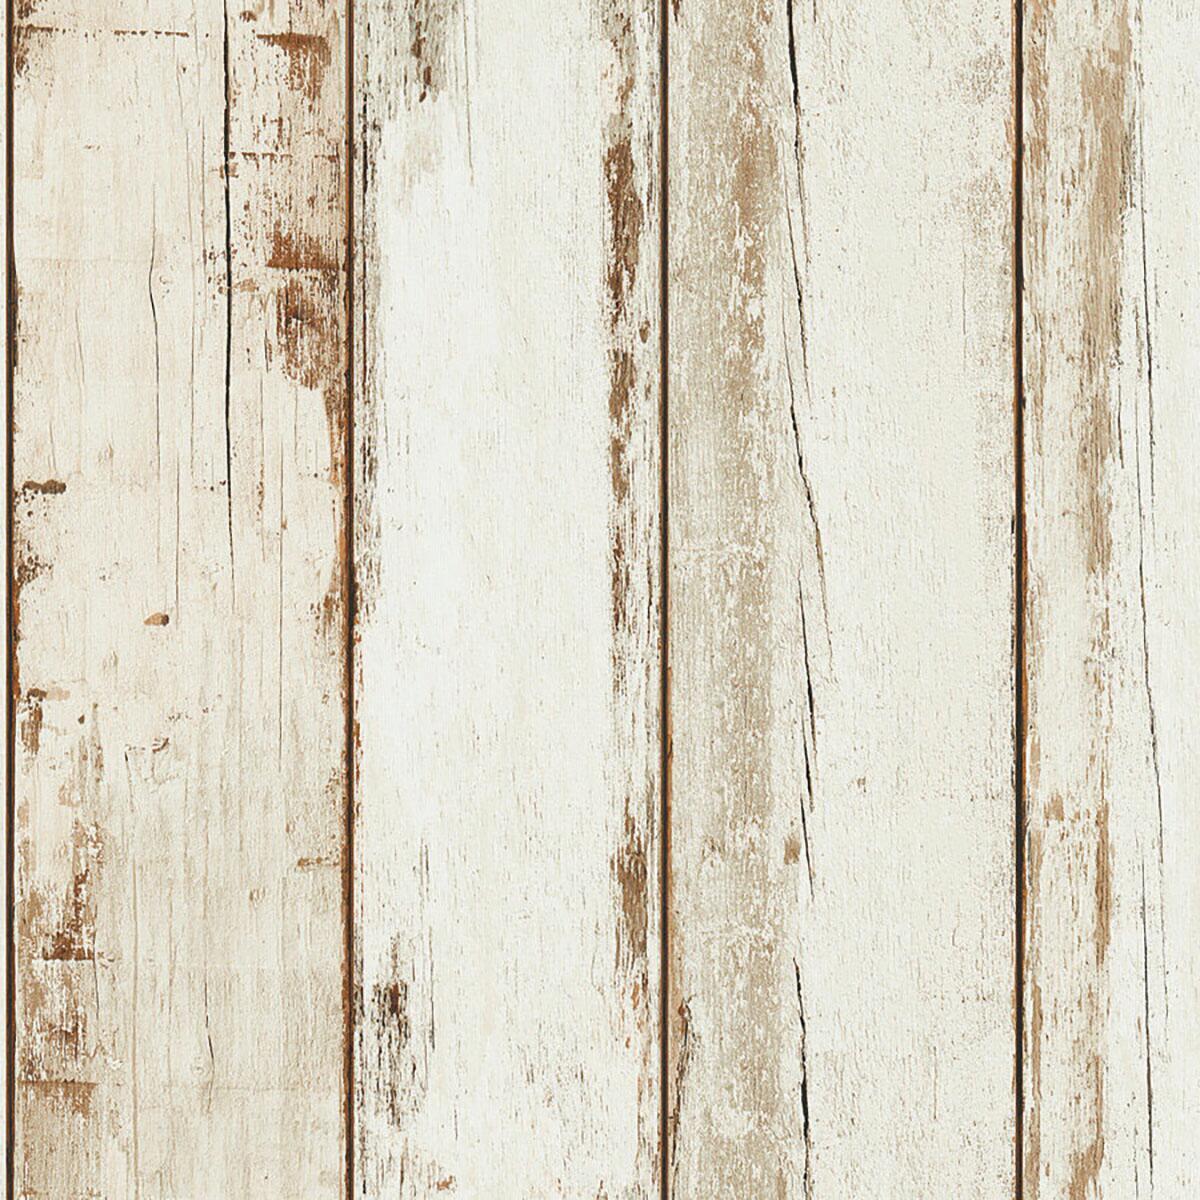 Aniceday carta da parati effetto legno, pellicola adesiva autoadesiva effetto legno rustico carta adesiva adesiva legno per decorare toilette tavolo armadio. Carta Da Parati Doghe Legno Beige 53 Cm X 10 M Leroy Merlin